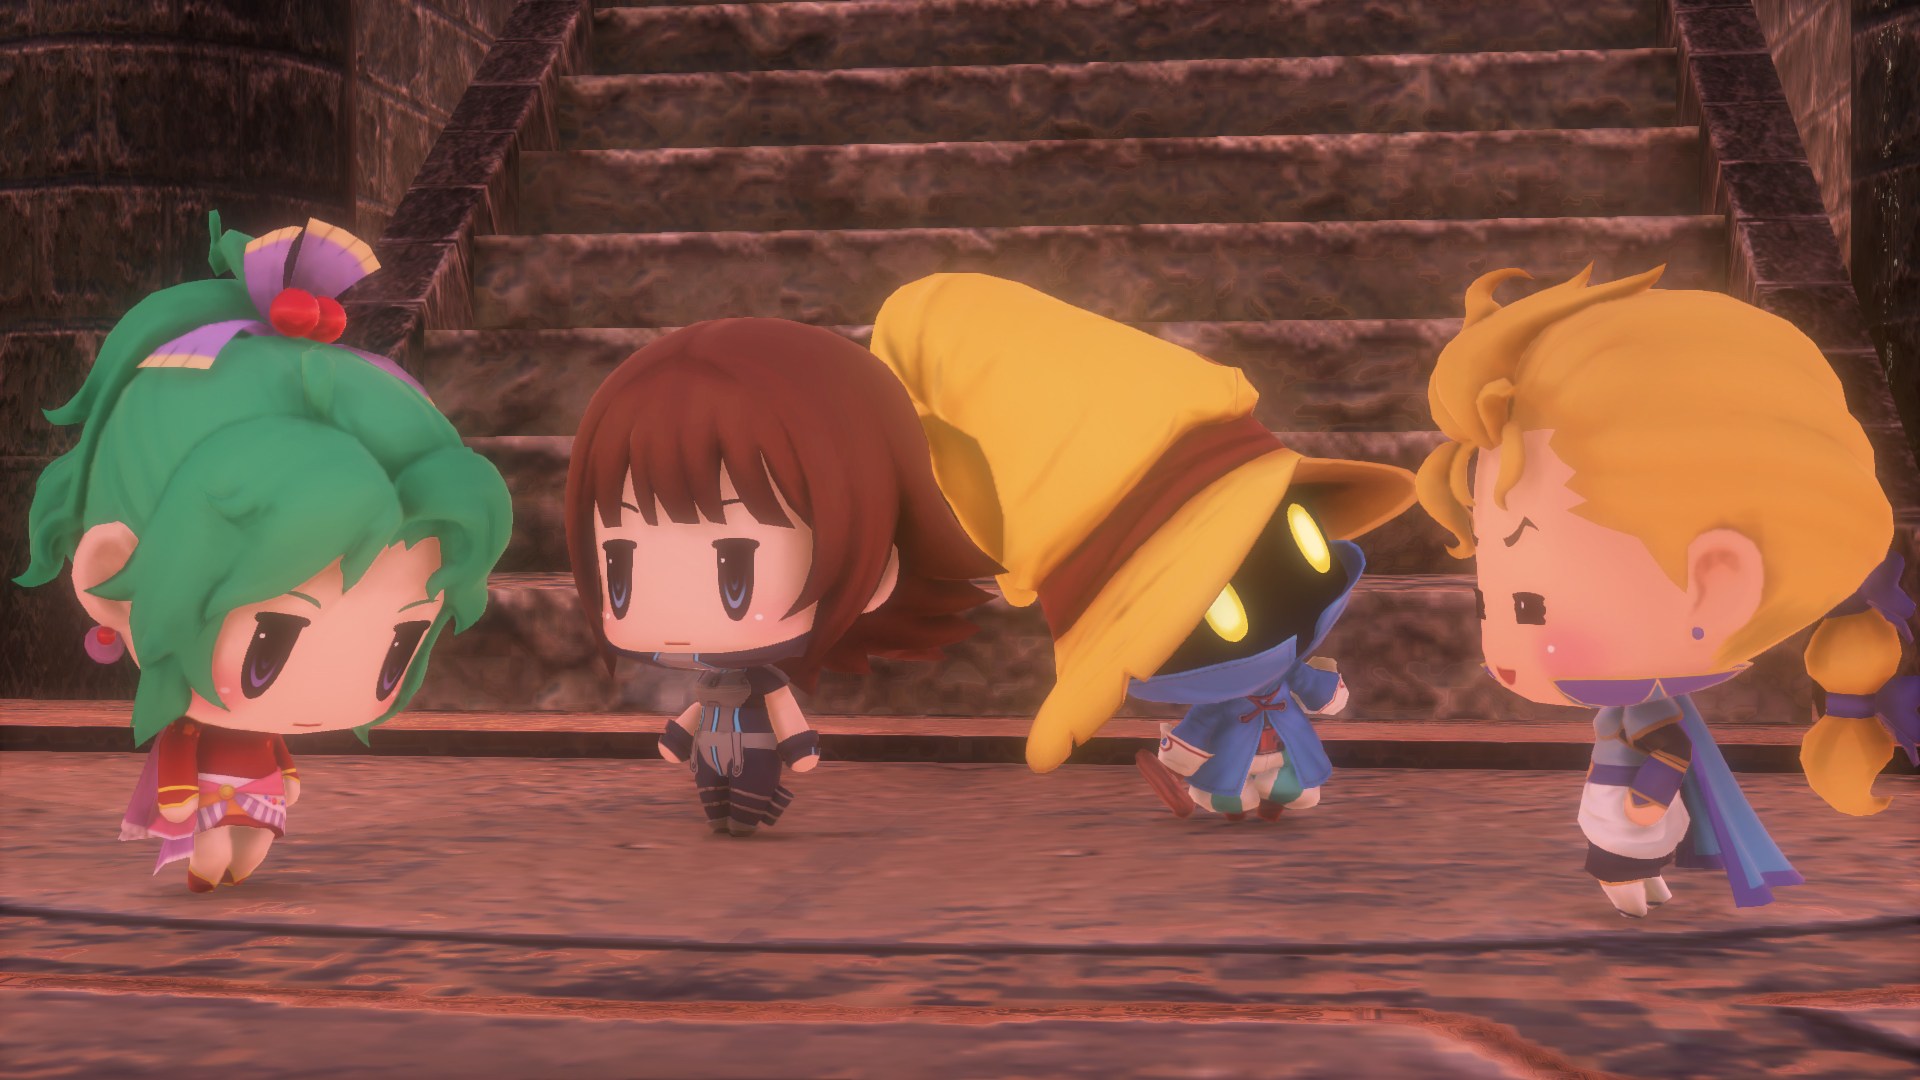 Modojo | World of Final Fantasy Gets a Demo October 17